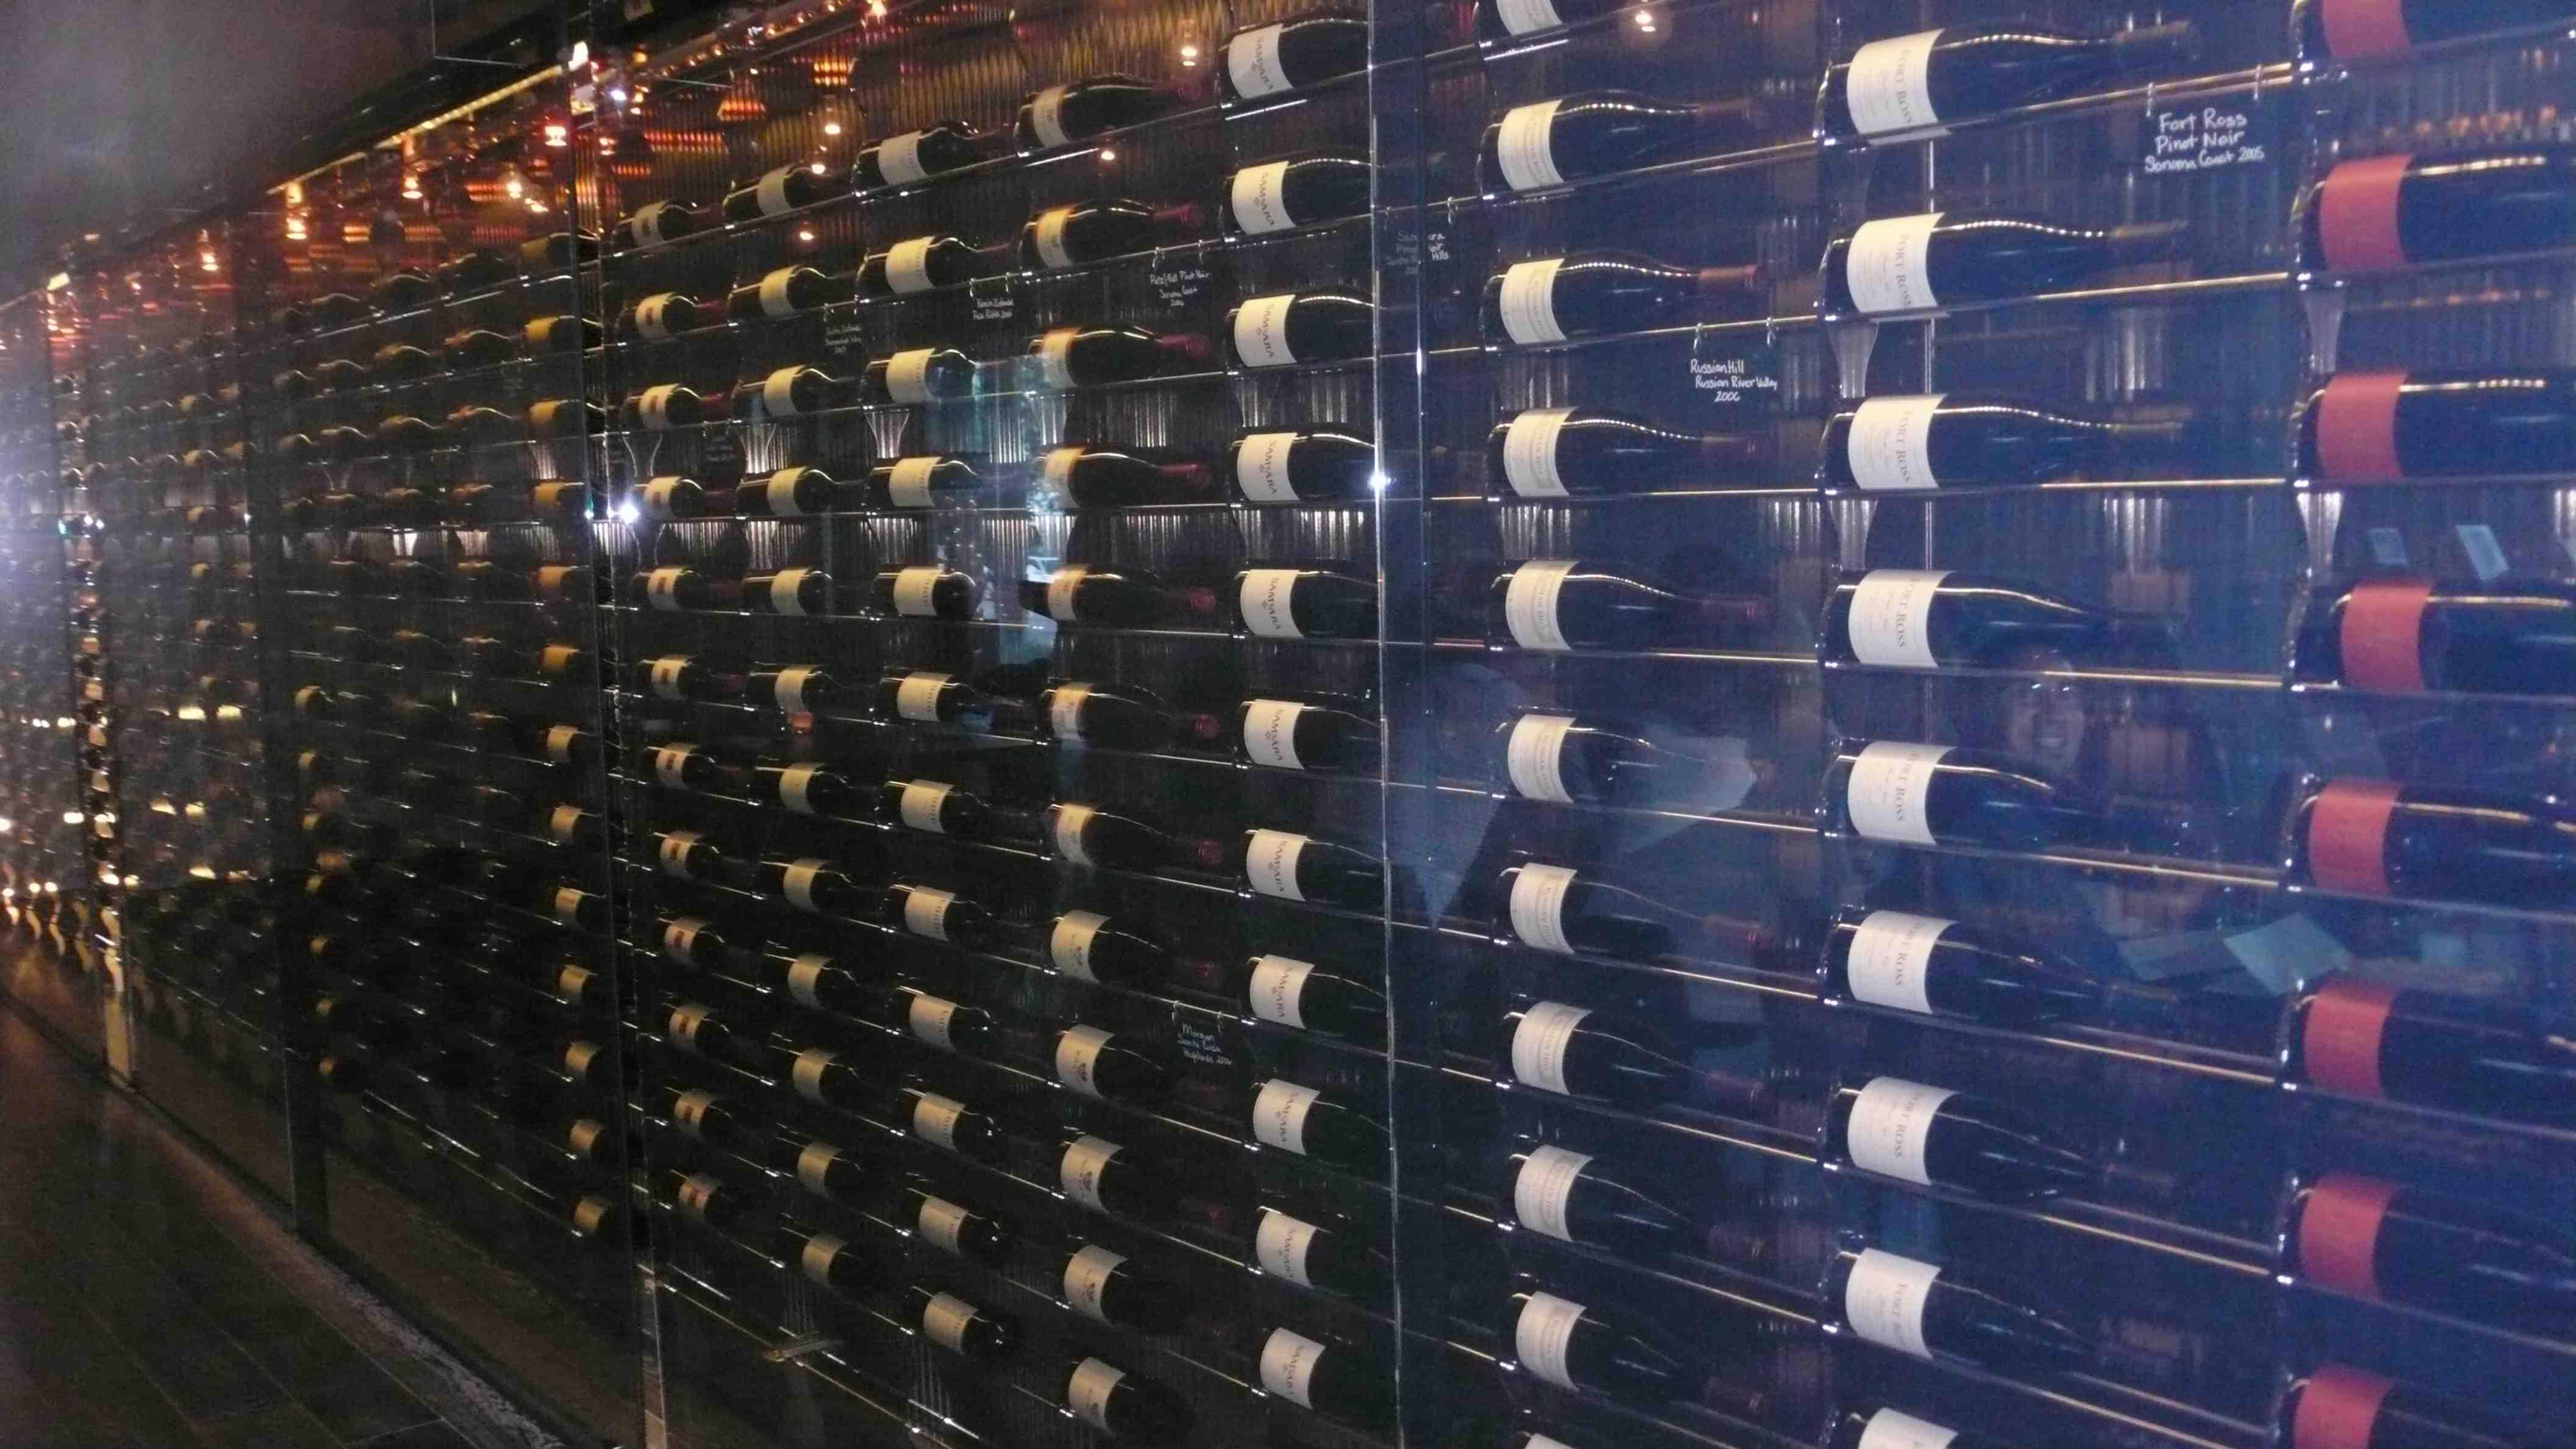 Open wine cellar